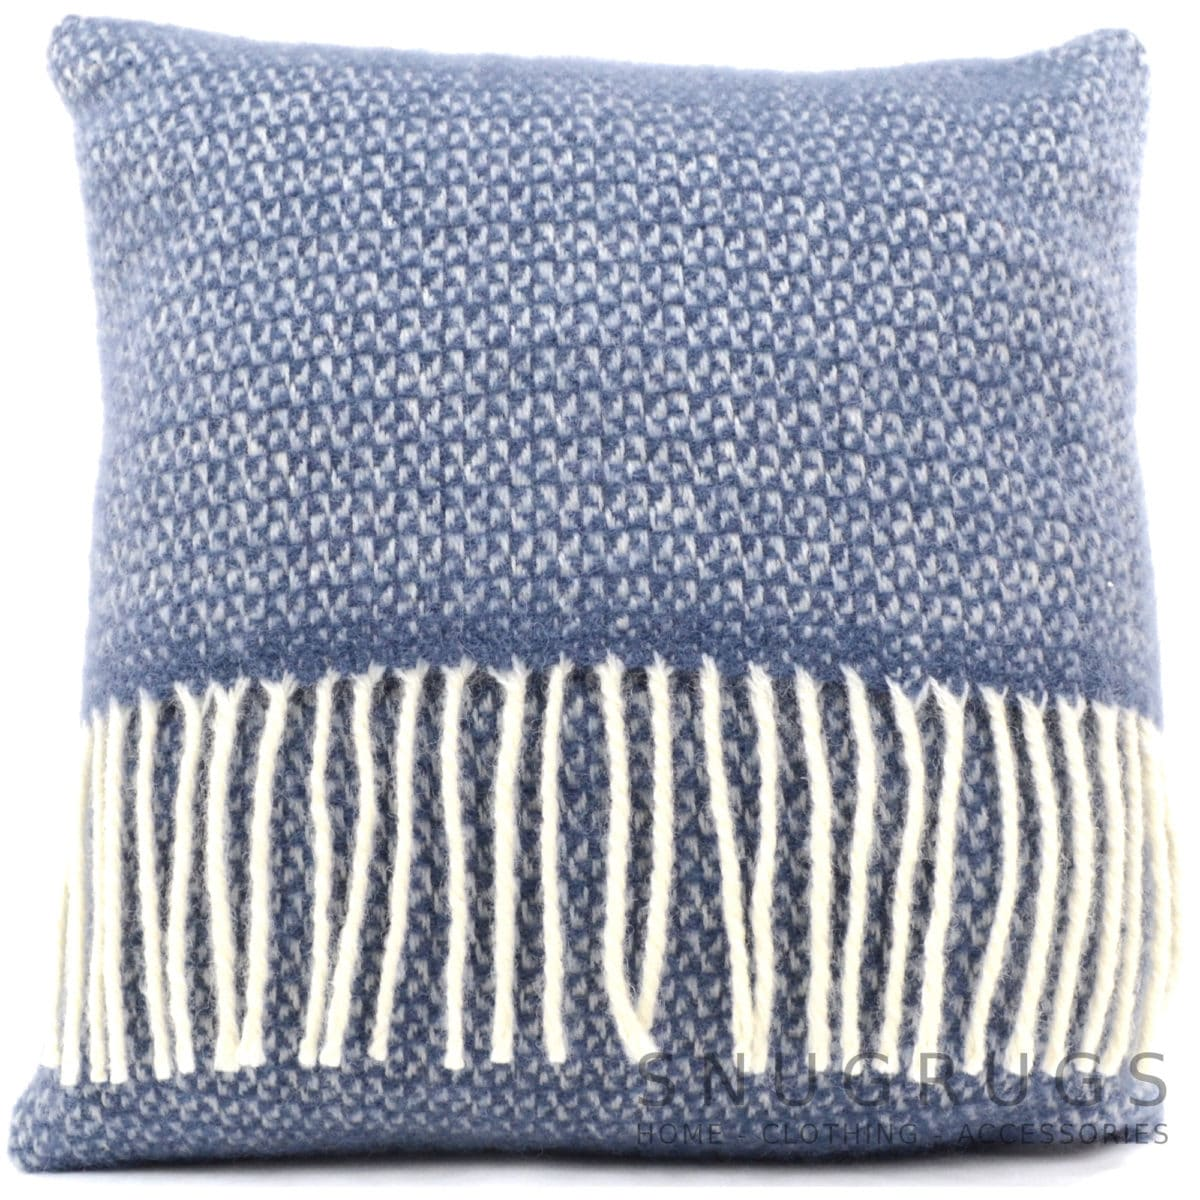 Illusion Wool Cushion - Blue Slate